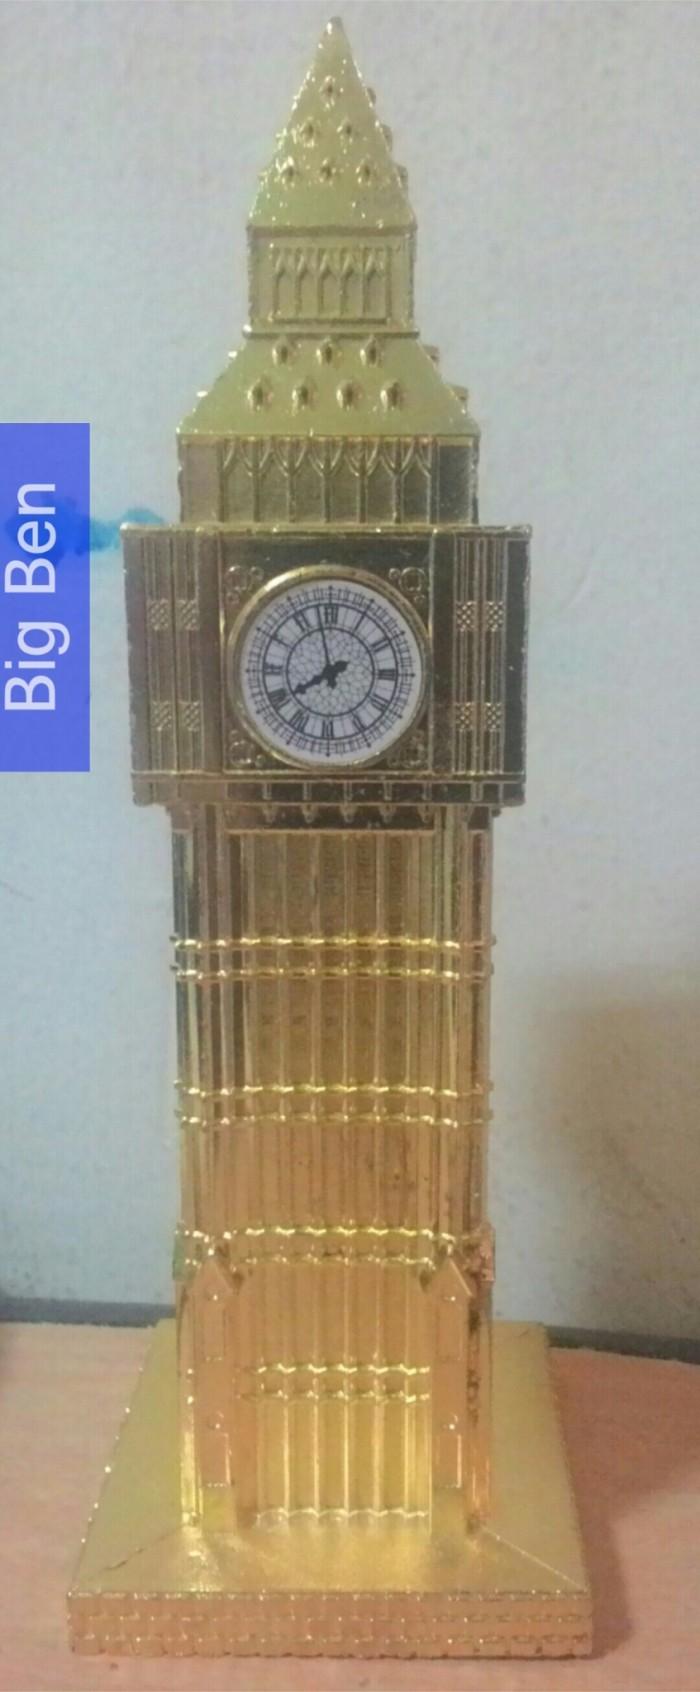 Jual Miniatur Menara Big Ben London Jakarta Barat C&C Shop